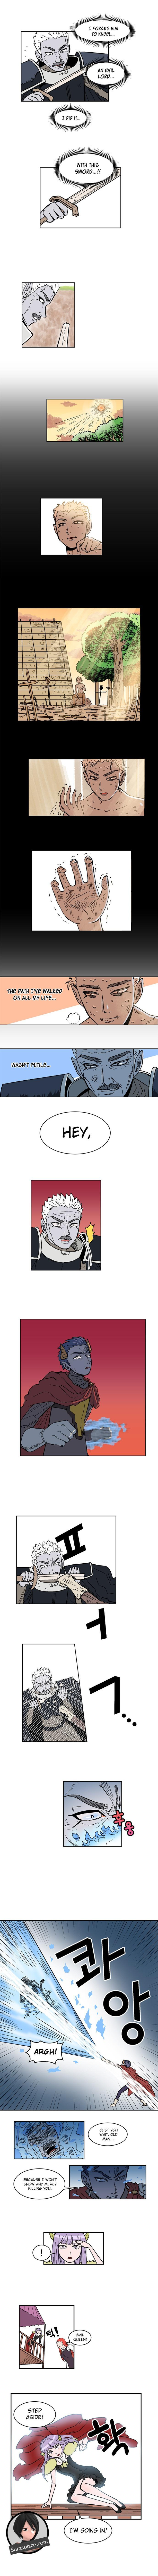 [Surasplace][Webtoon]Evil Queen-ep123-2 by sura-of-surasplace